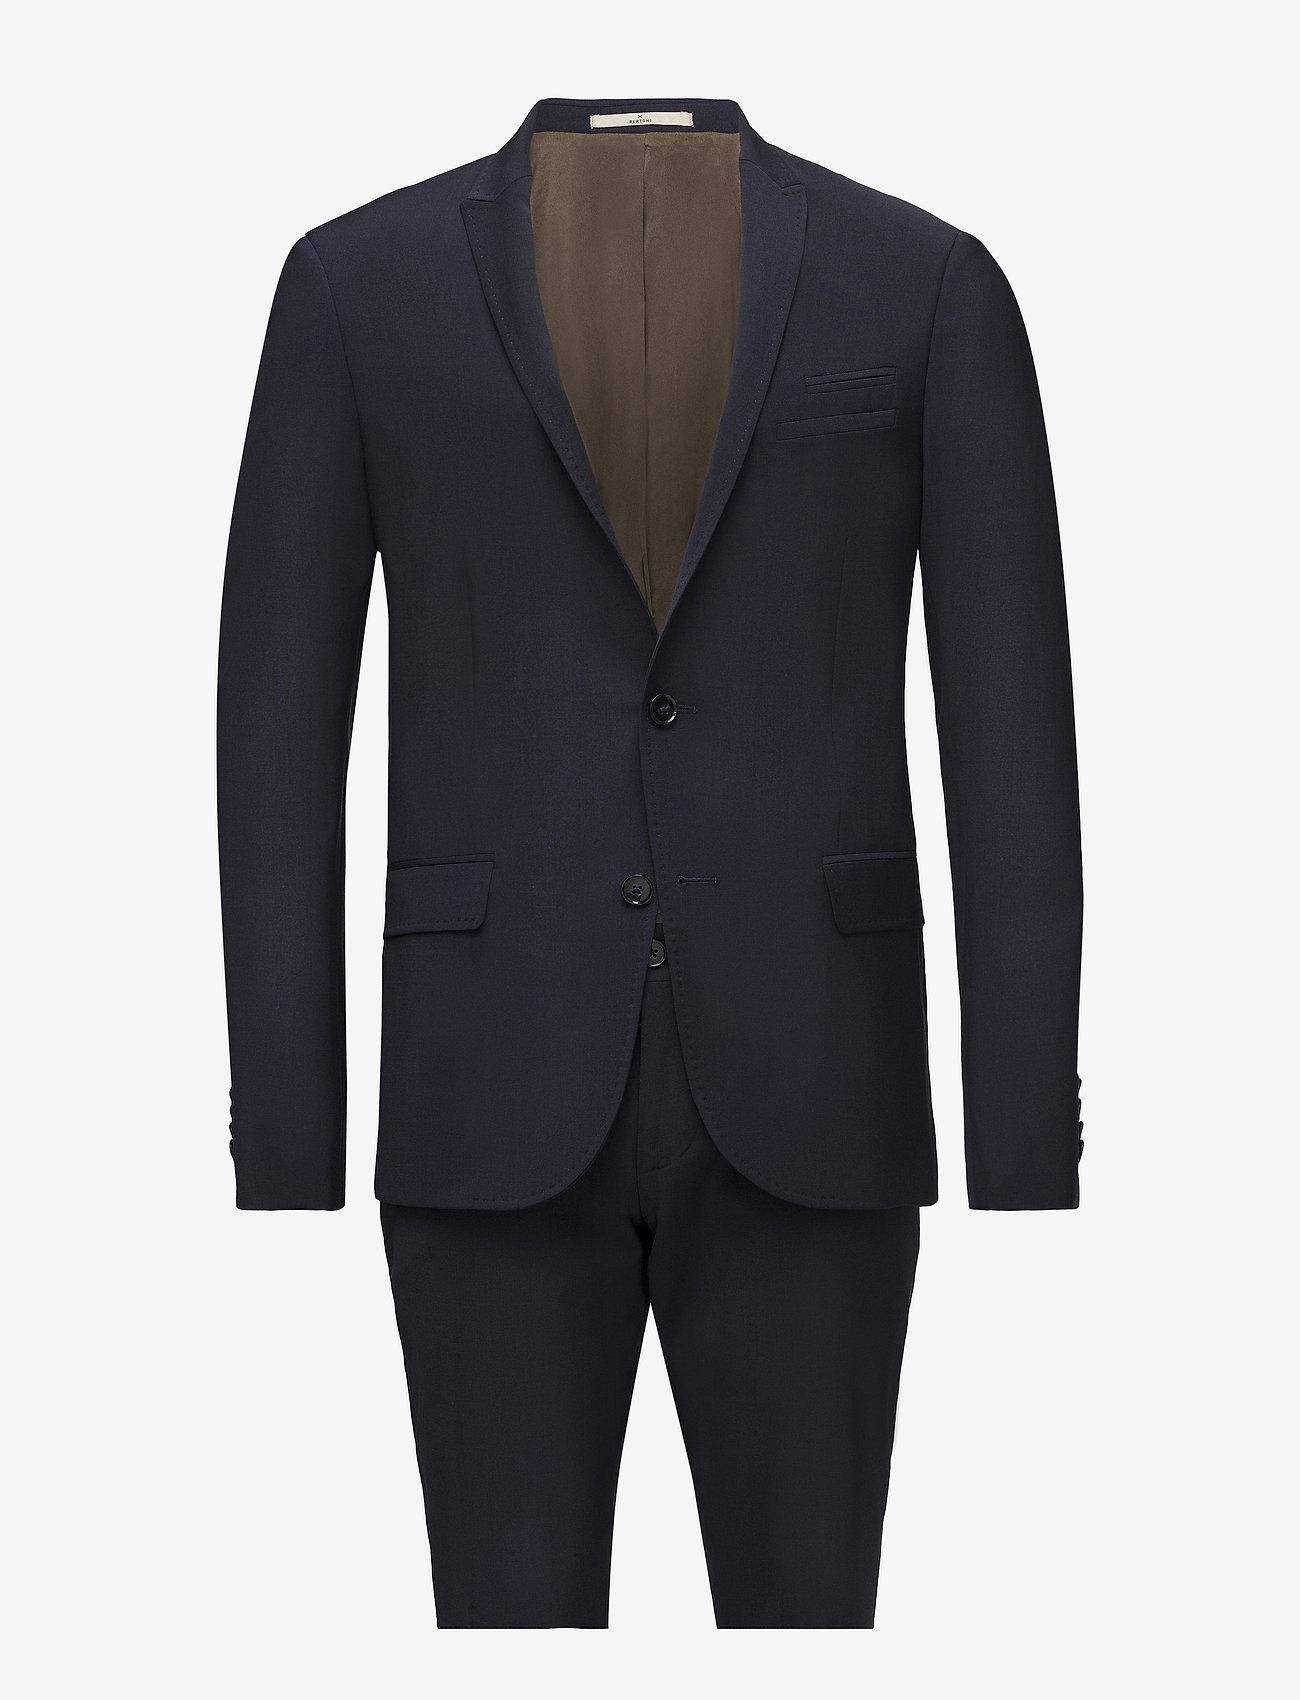 Bertoni - Davidsen-Ravn - single breasted suits - 744 blueprint - 0